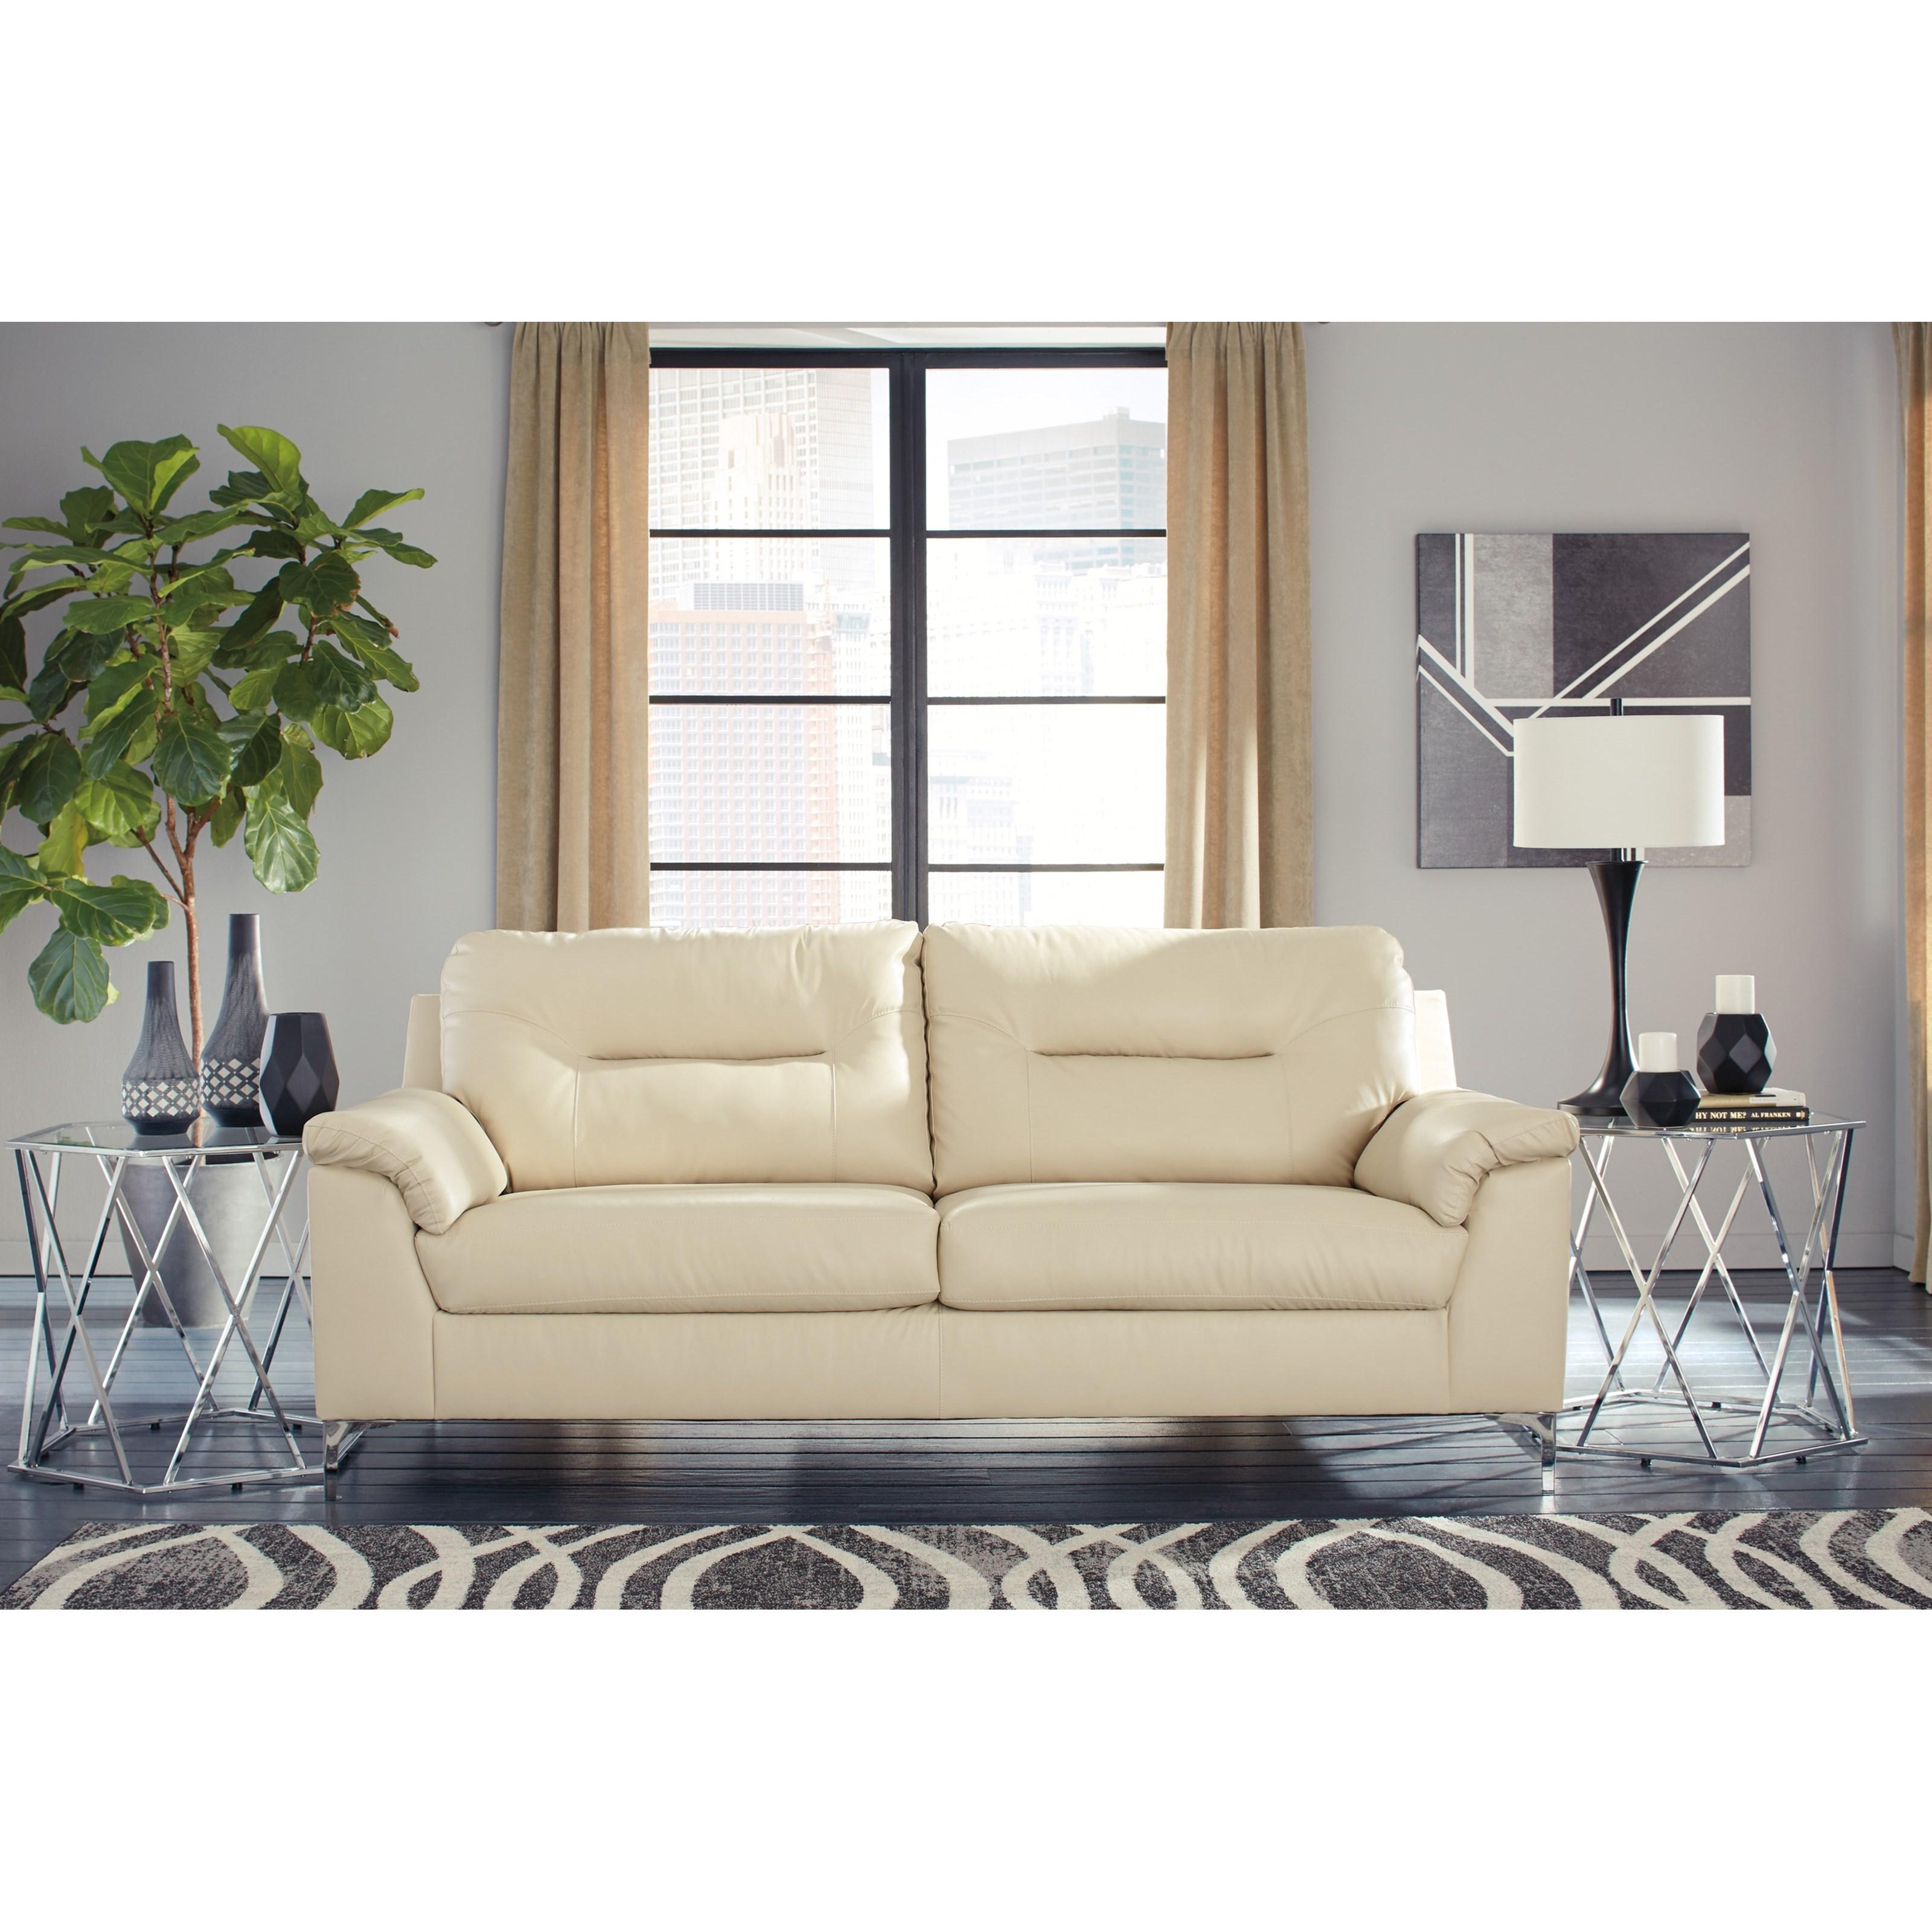 Signature Design By Ashley Tensas Contemporary Sofa With